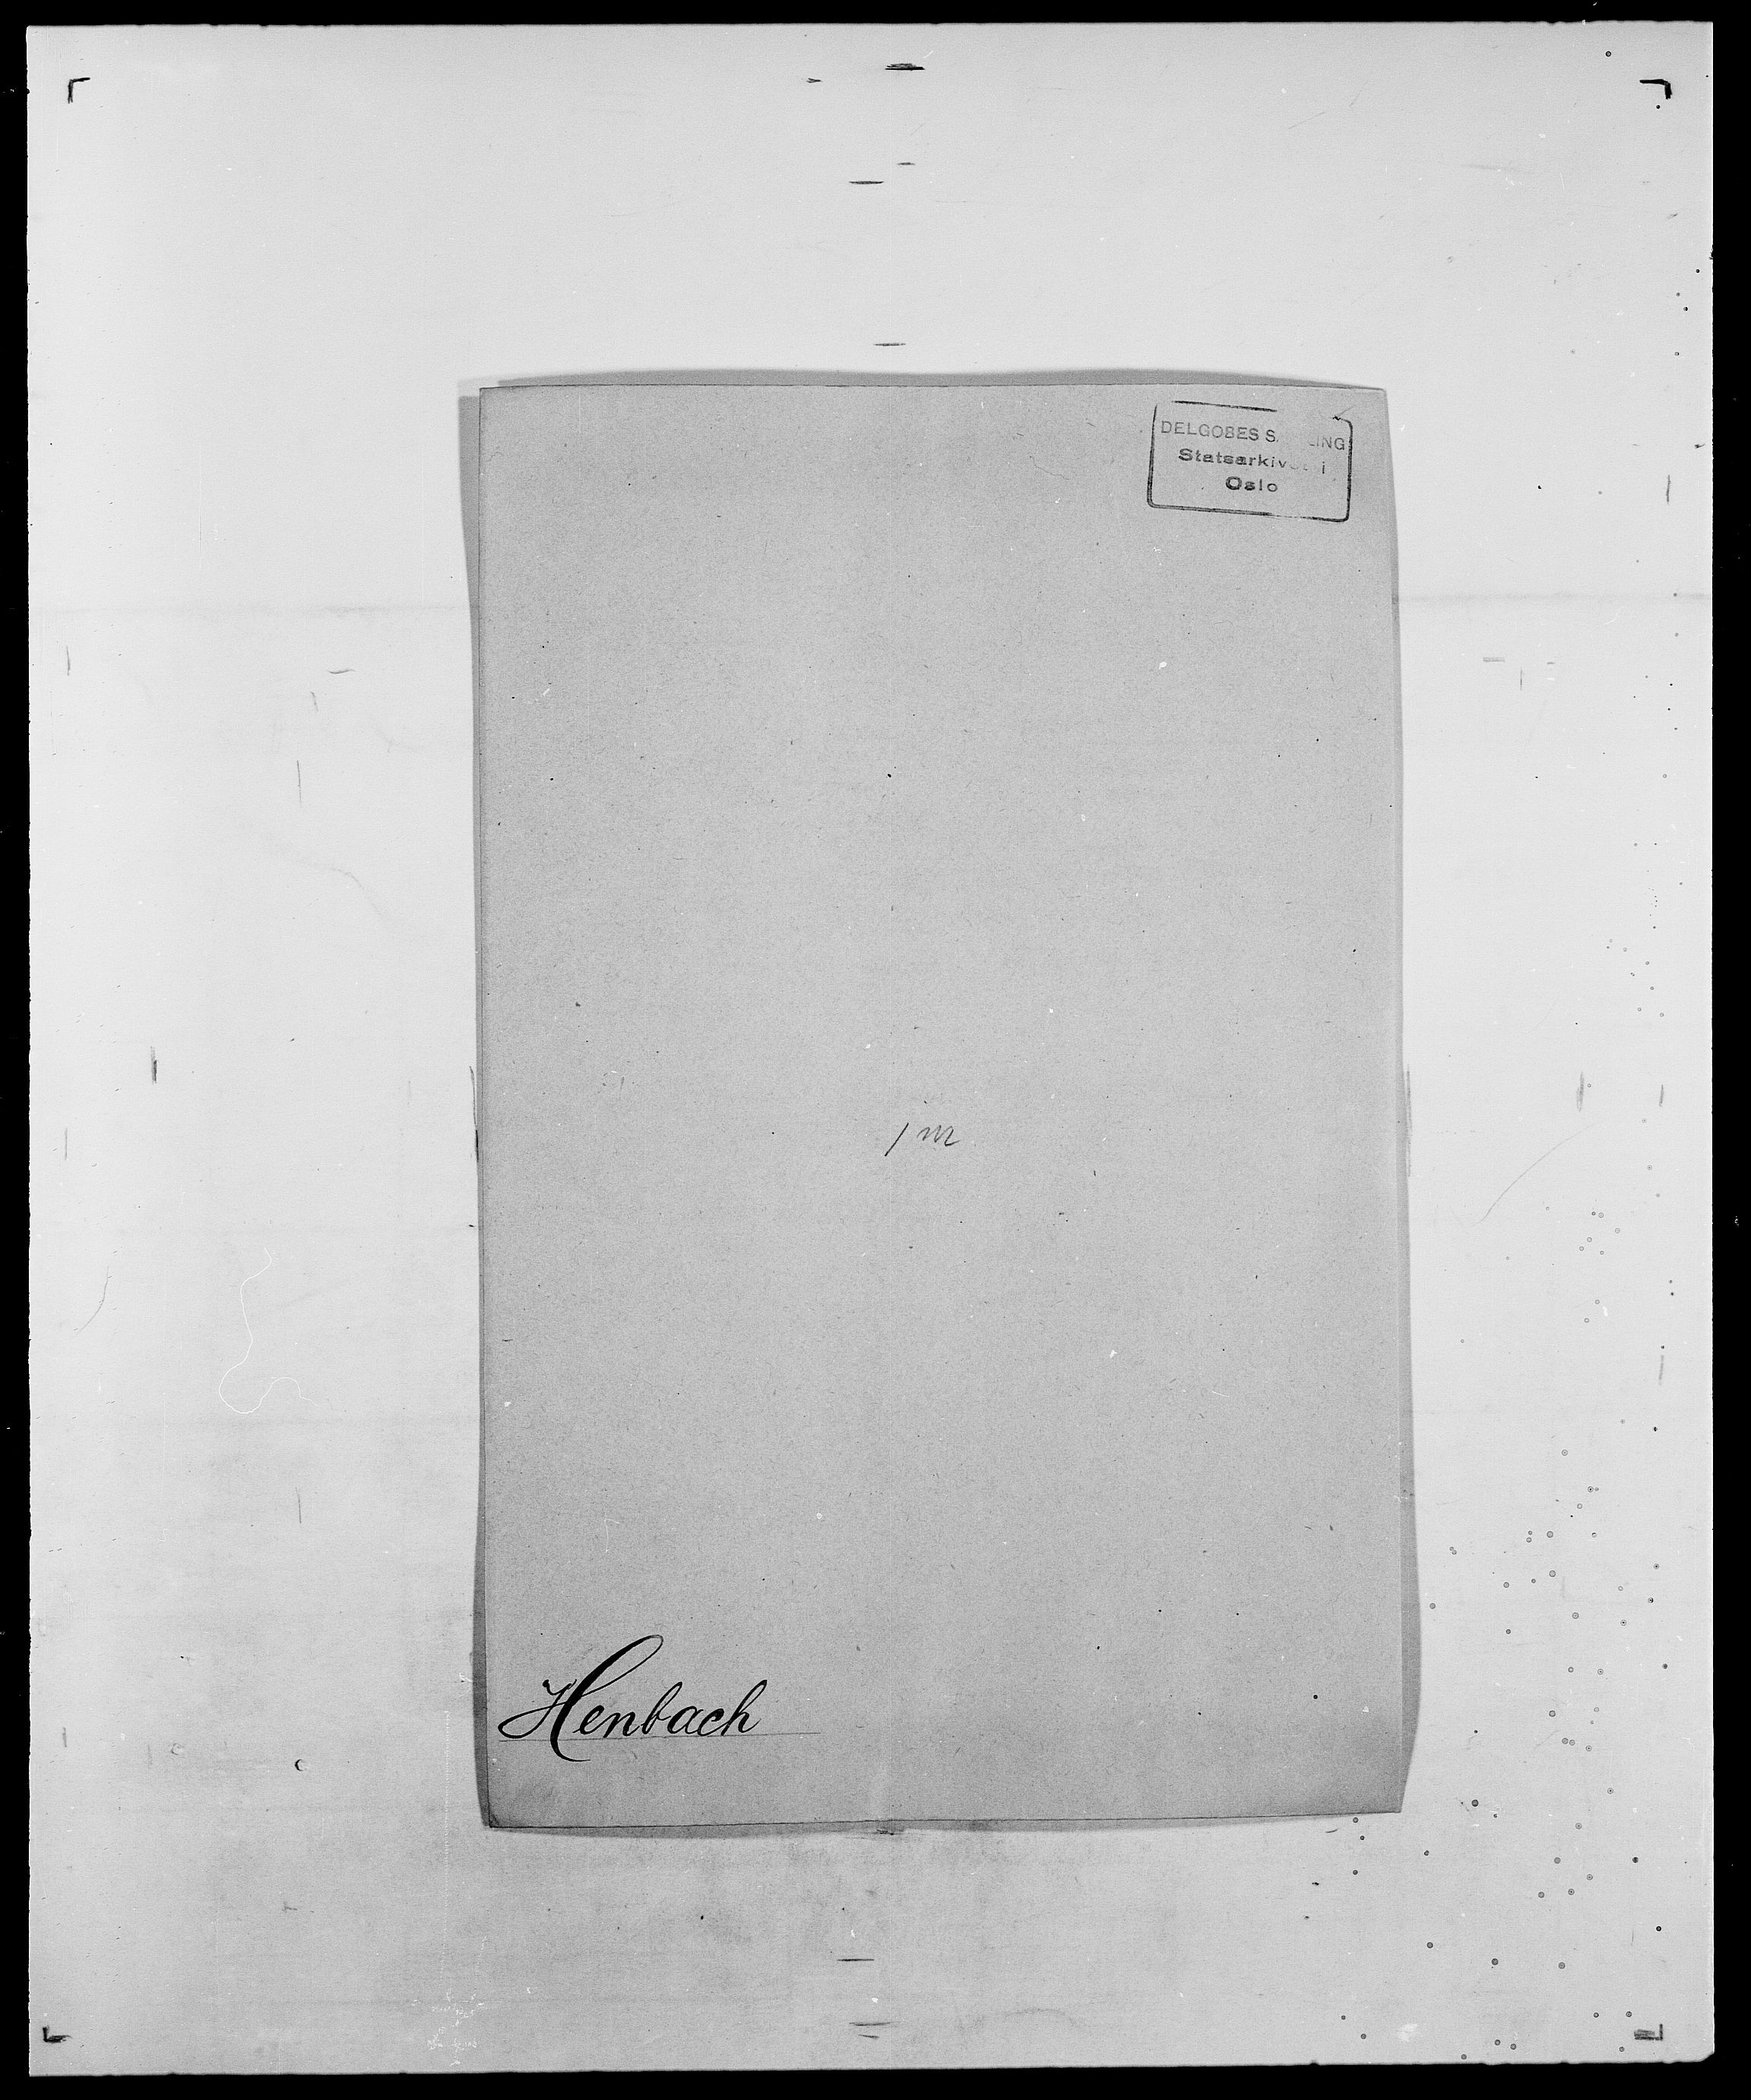 SAO, Delgobe, Charles Antoine - samling, D/Da/L0017: Helander - Hjørne, s. 169